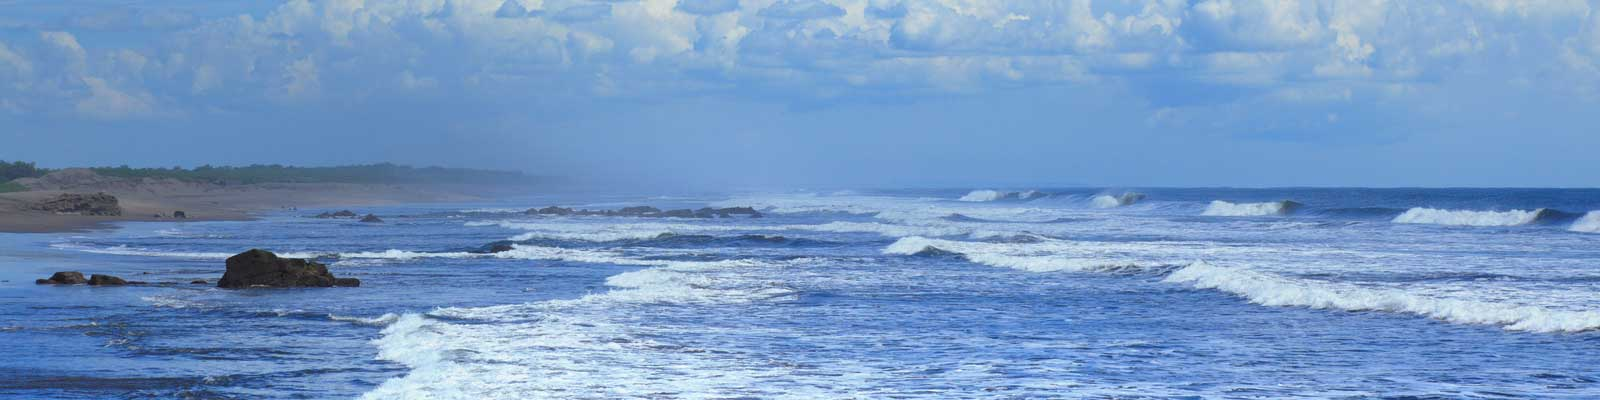 Nicaragua Praias Oceanos